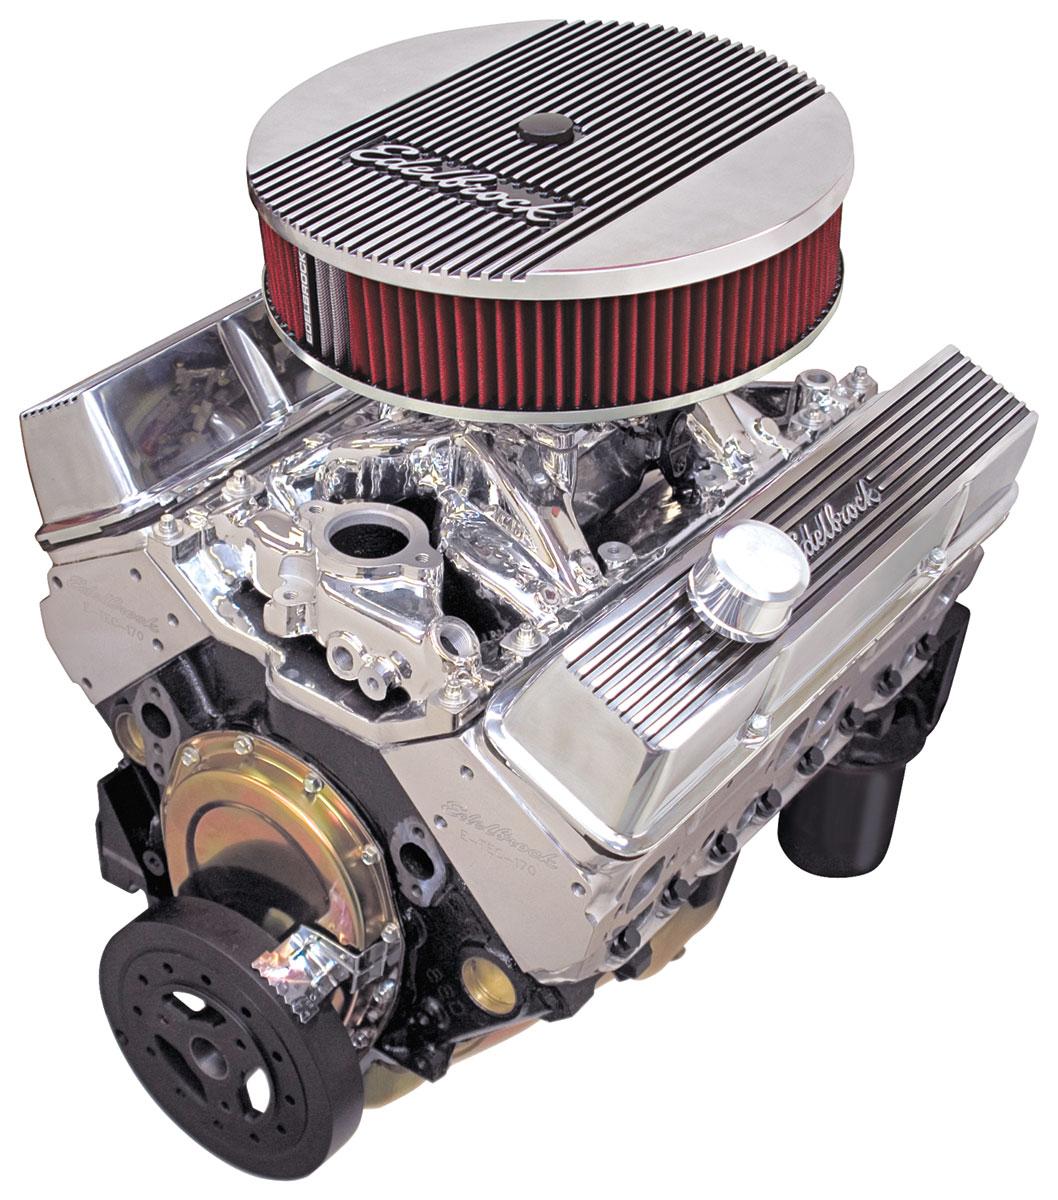 Crate Engine, RPM E-Tec, Edelbrock, Chevy 350, w/o Water Pump, EnduraShine